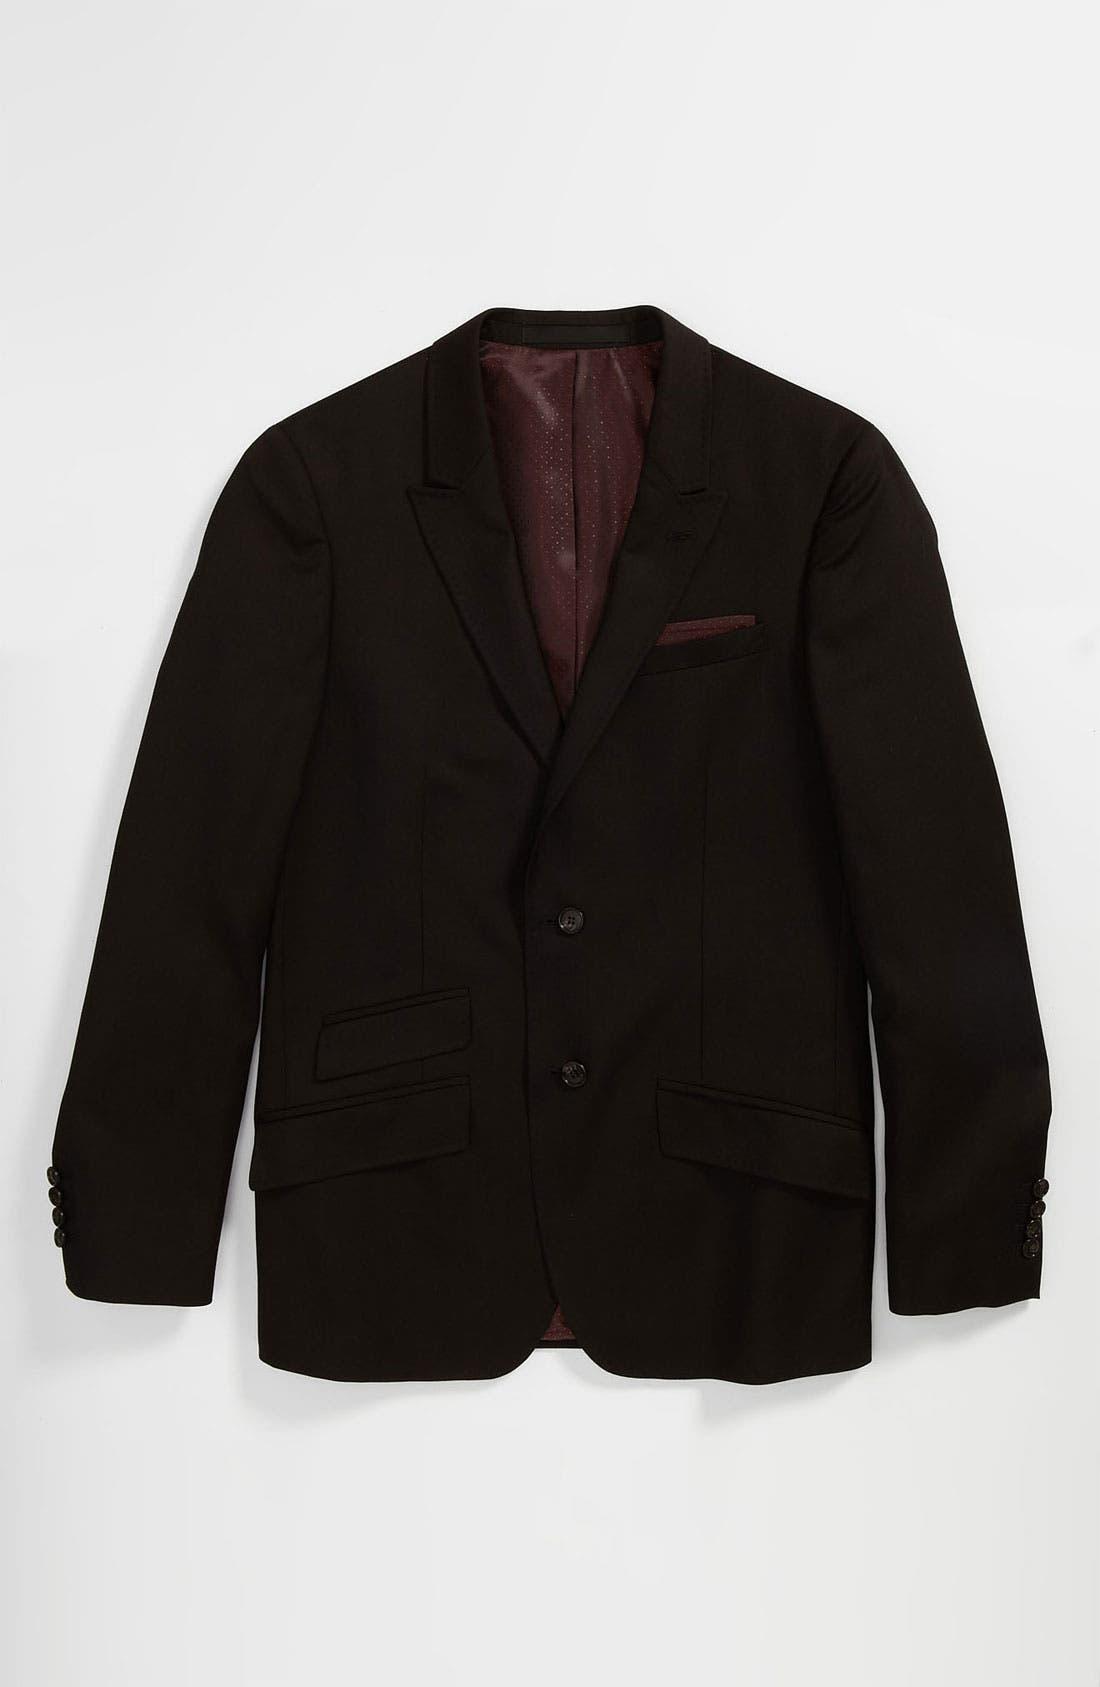 Alternate Image 1 Selected - Topman 'Super Premium - Russo' Trim Fit Blazer